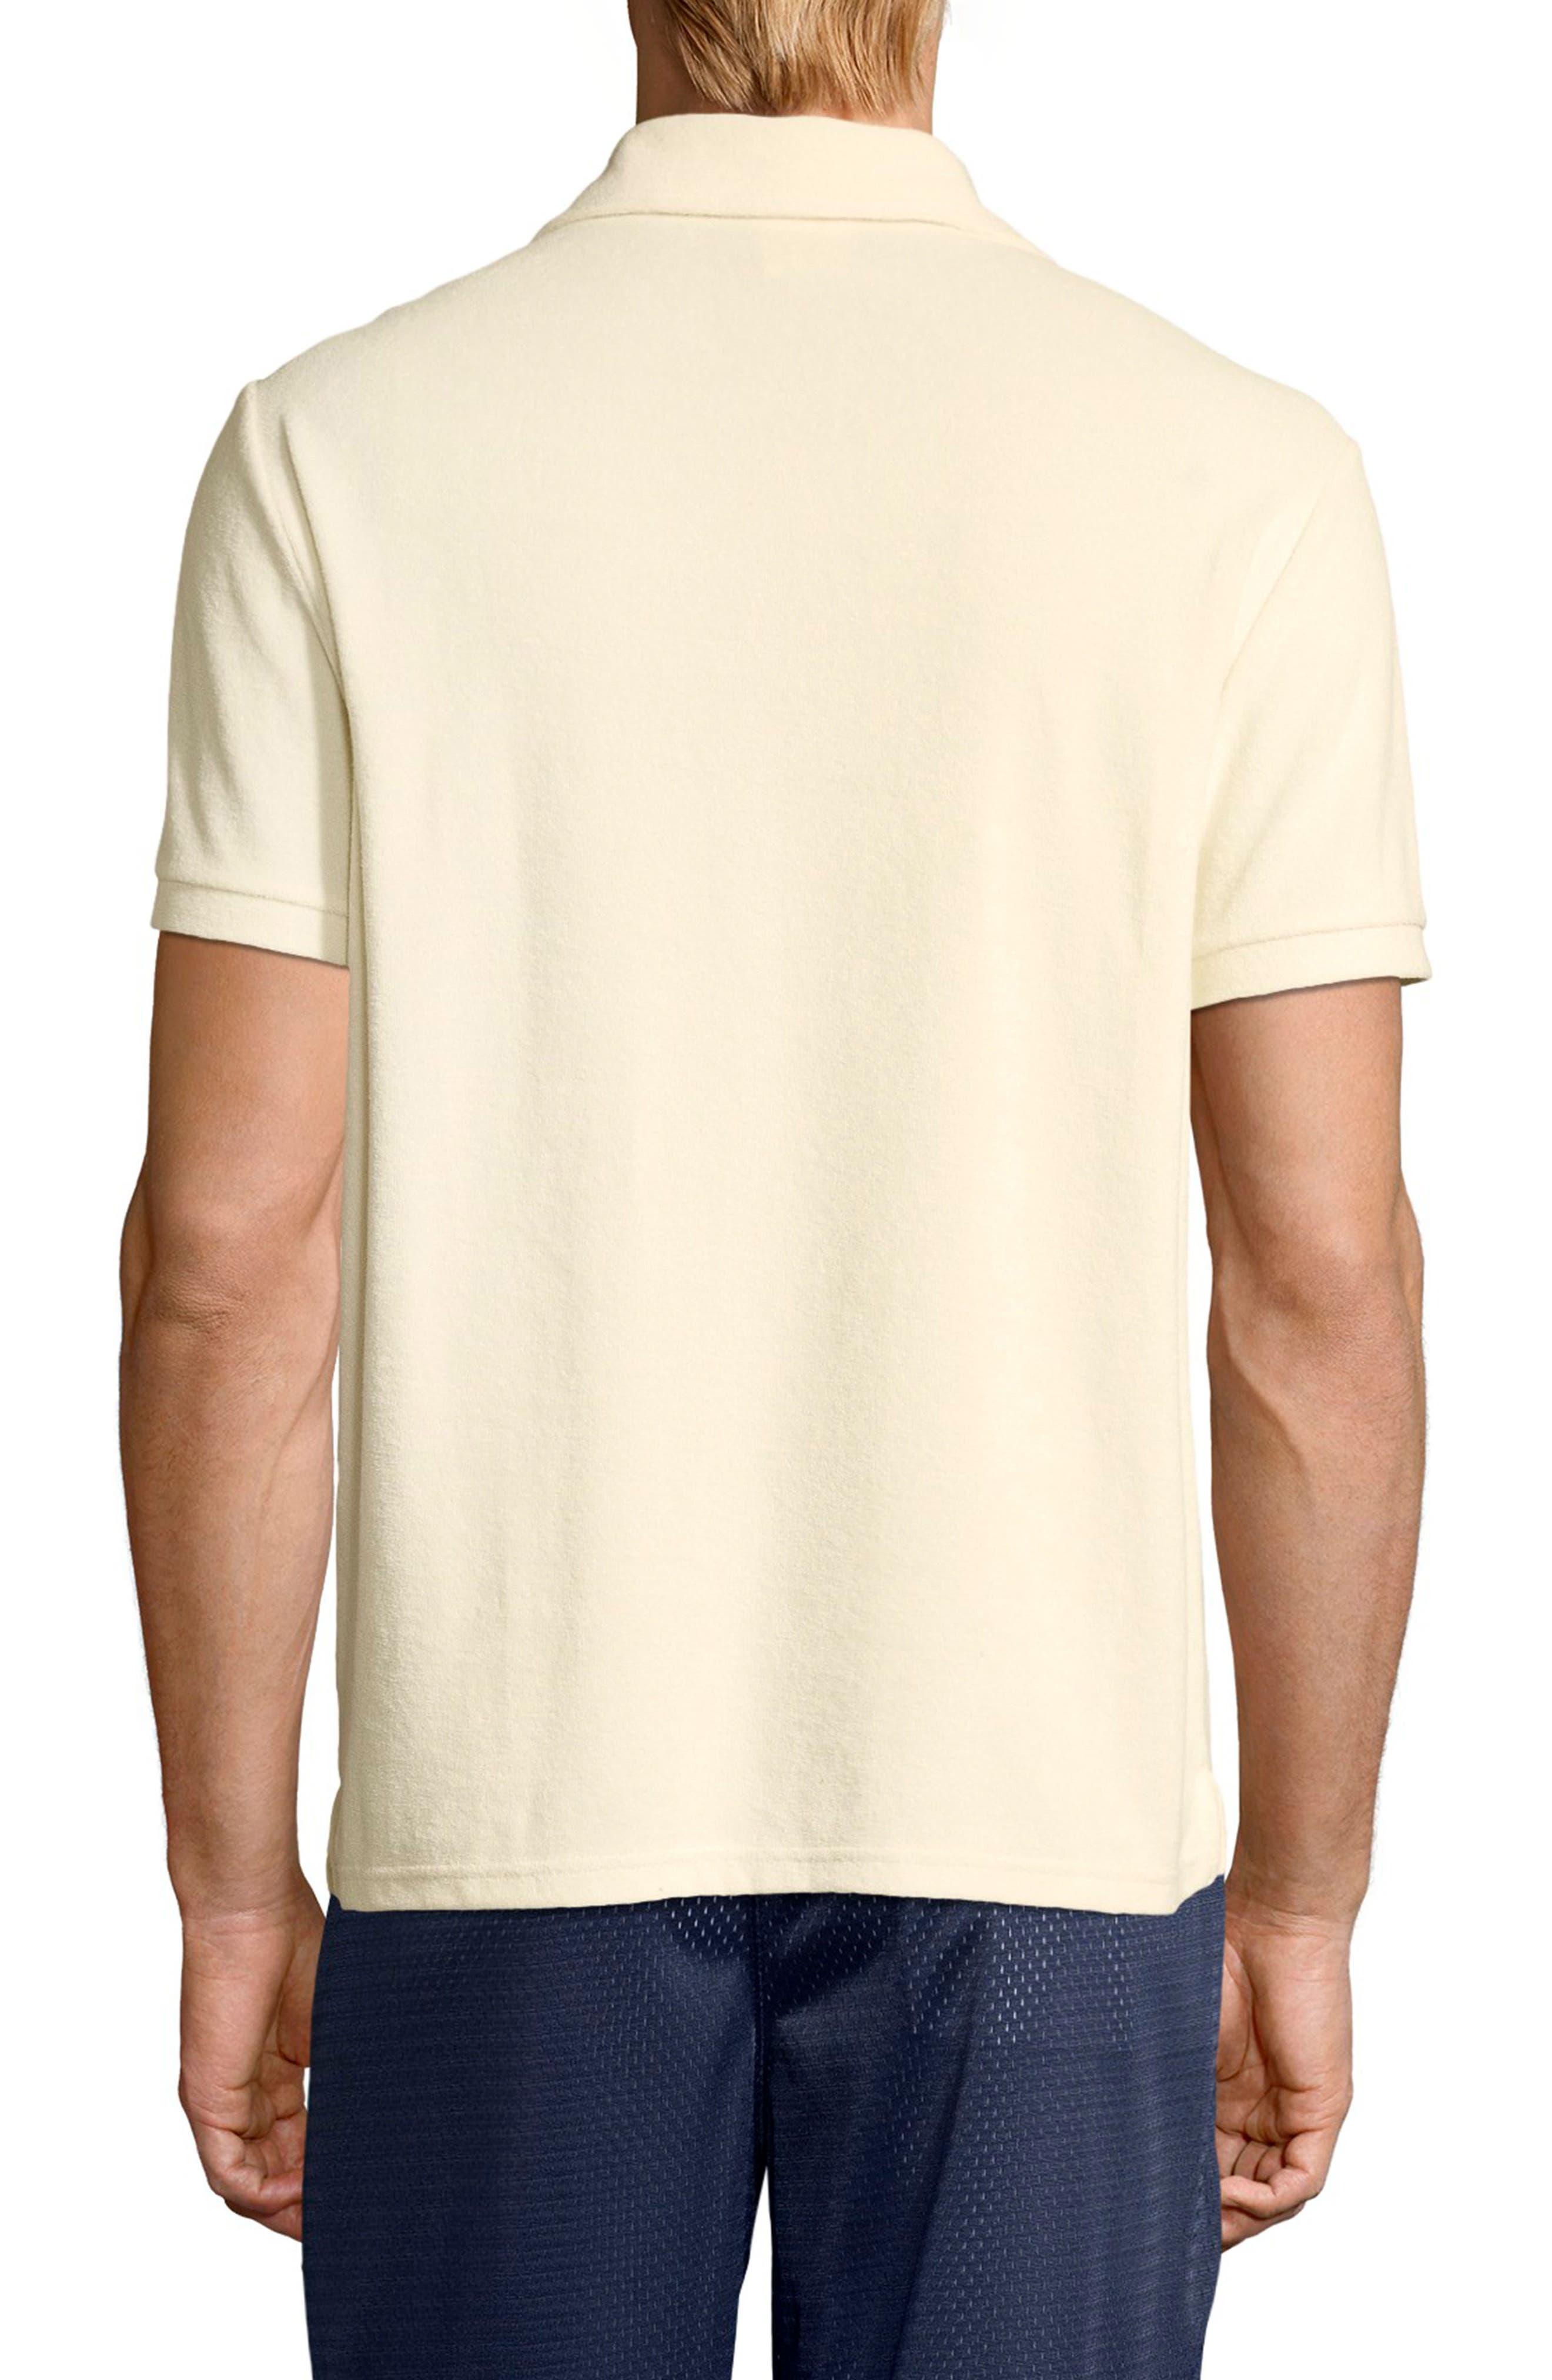 Sponge Terry Crewneck Sweatshirt,                             Alternate thumbnail 2, color,                             WHITE ALABASTER